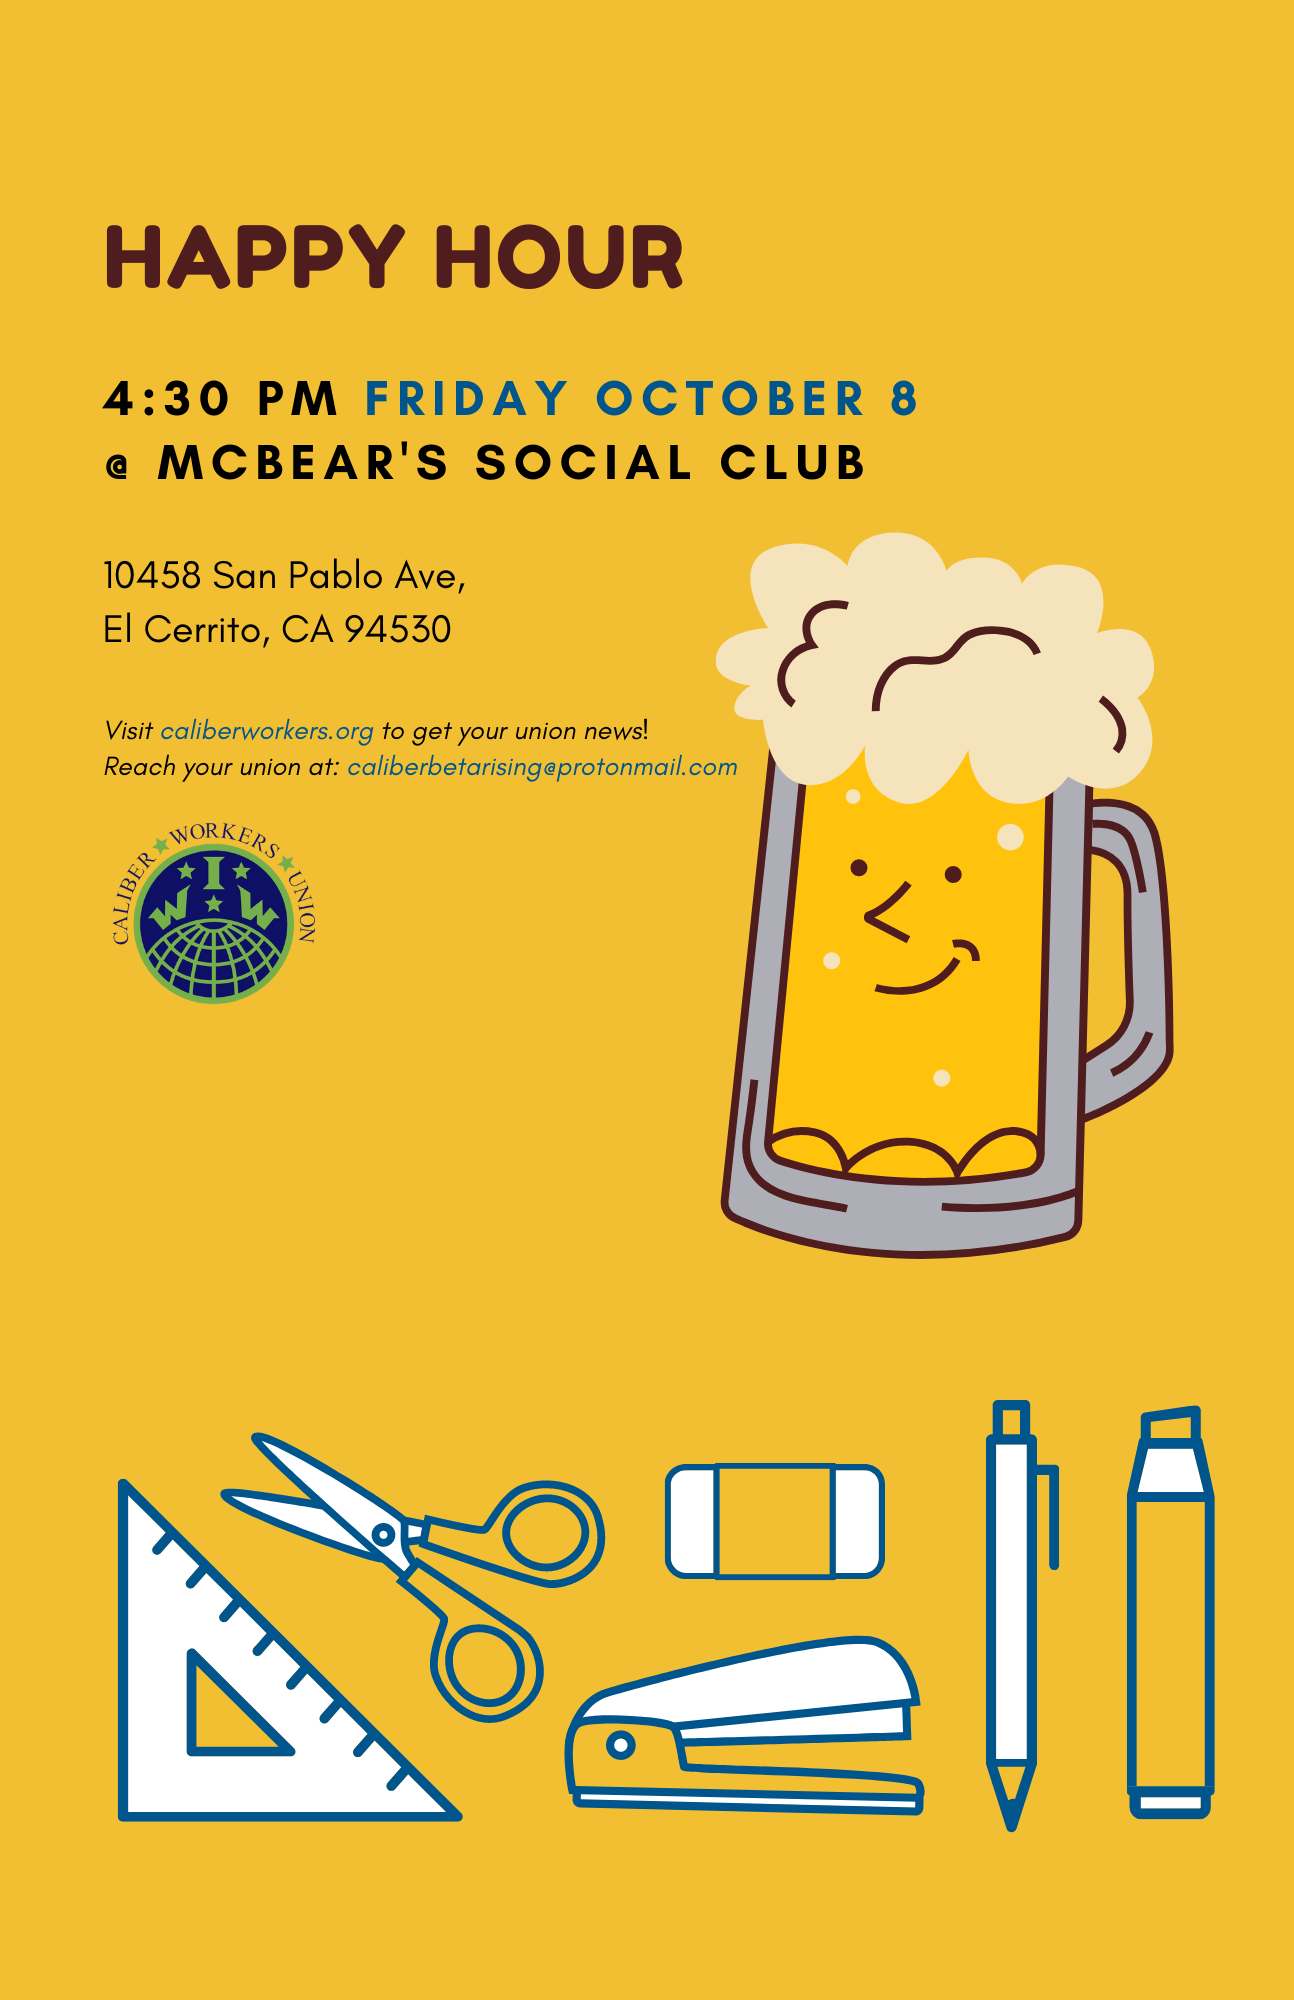 Happy Hour at McBear's Social Club 4:30PM Friday October 8th